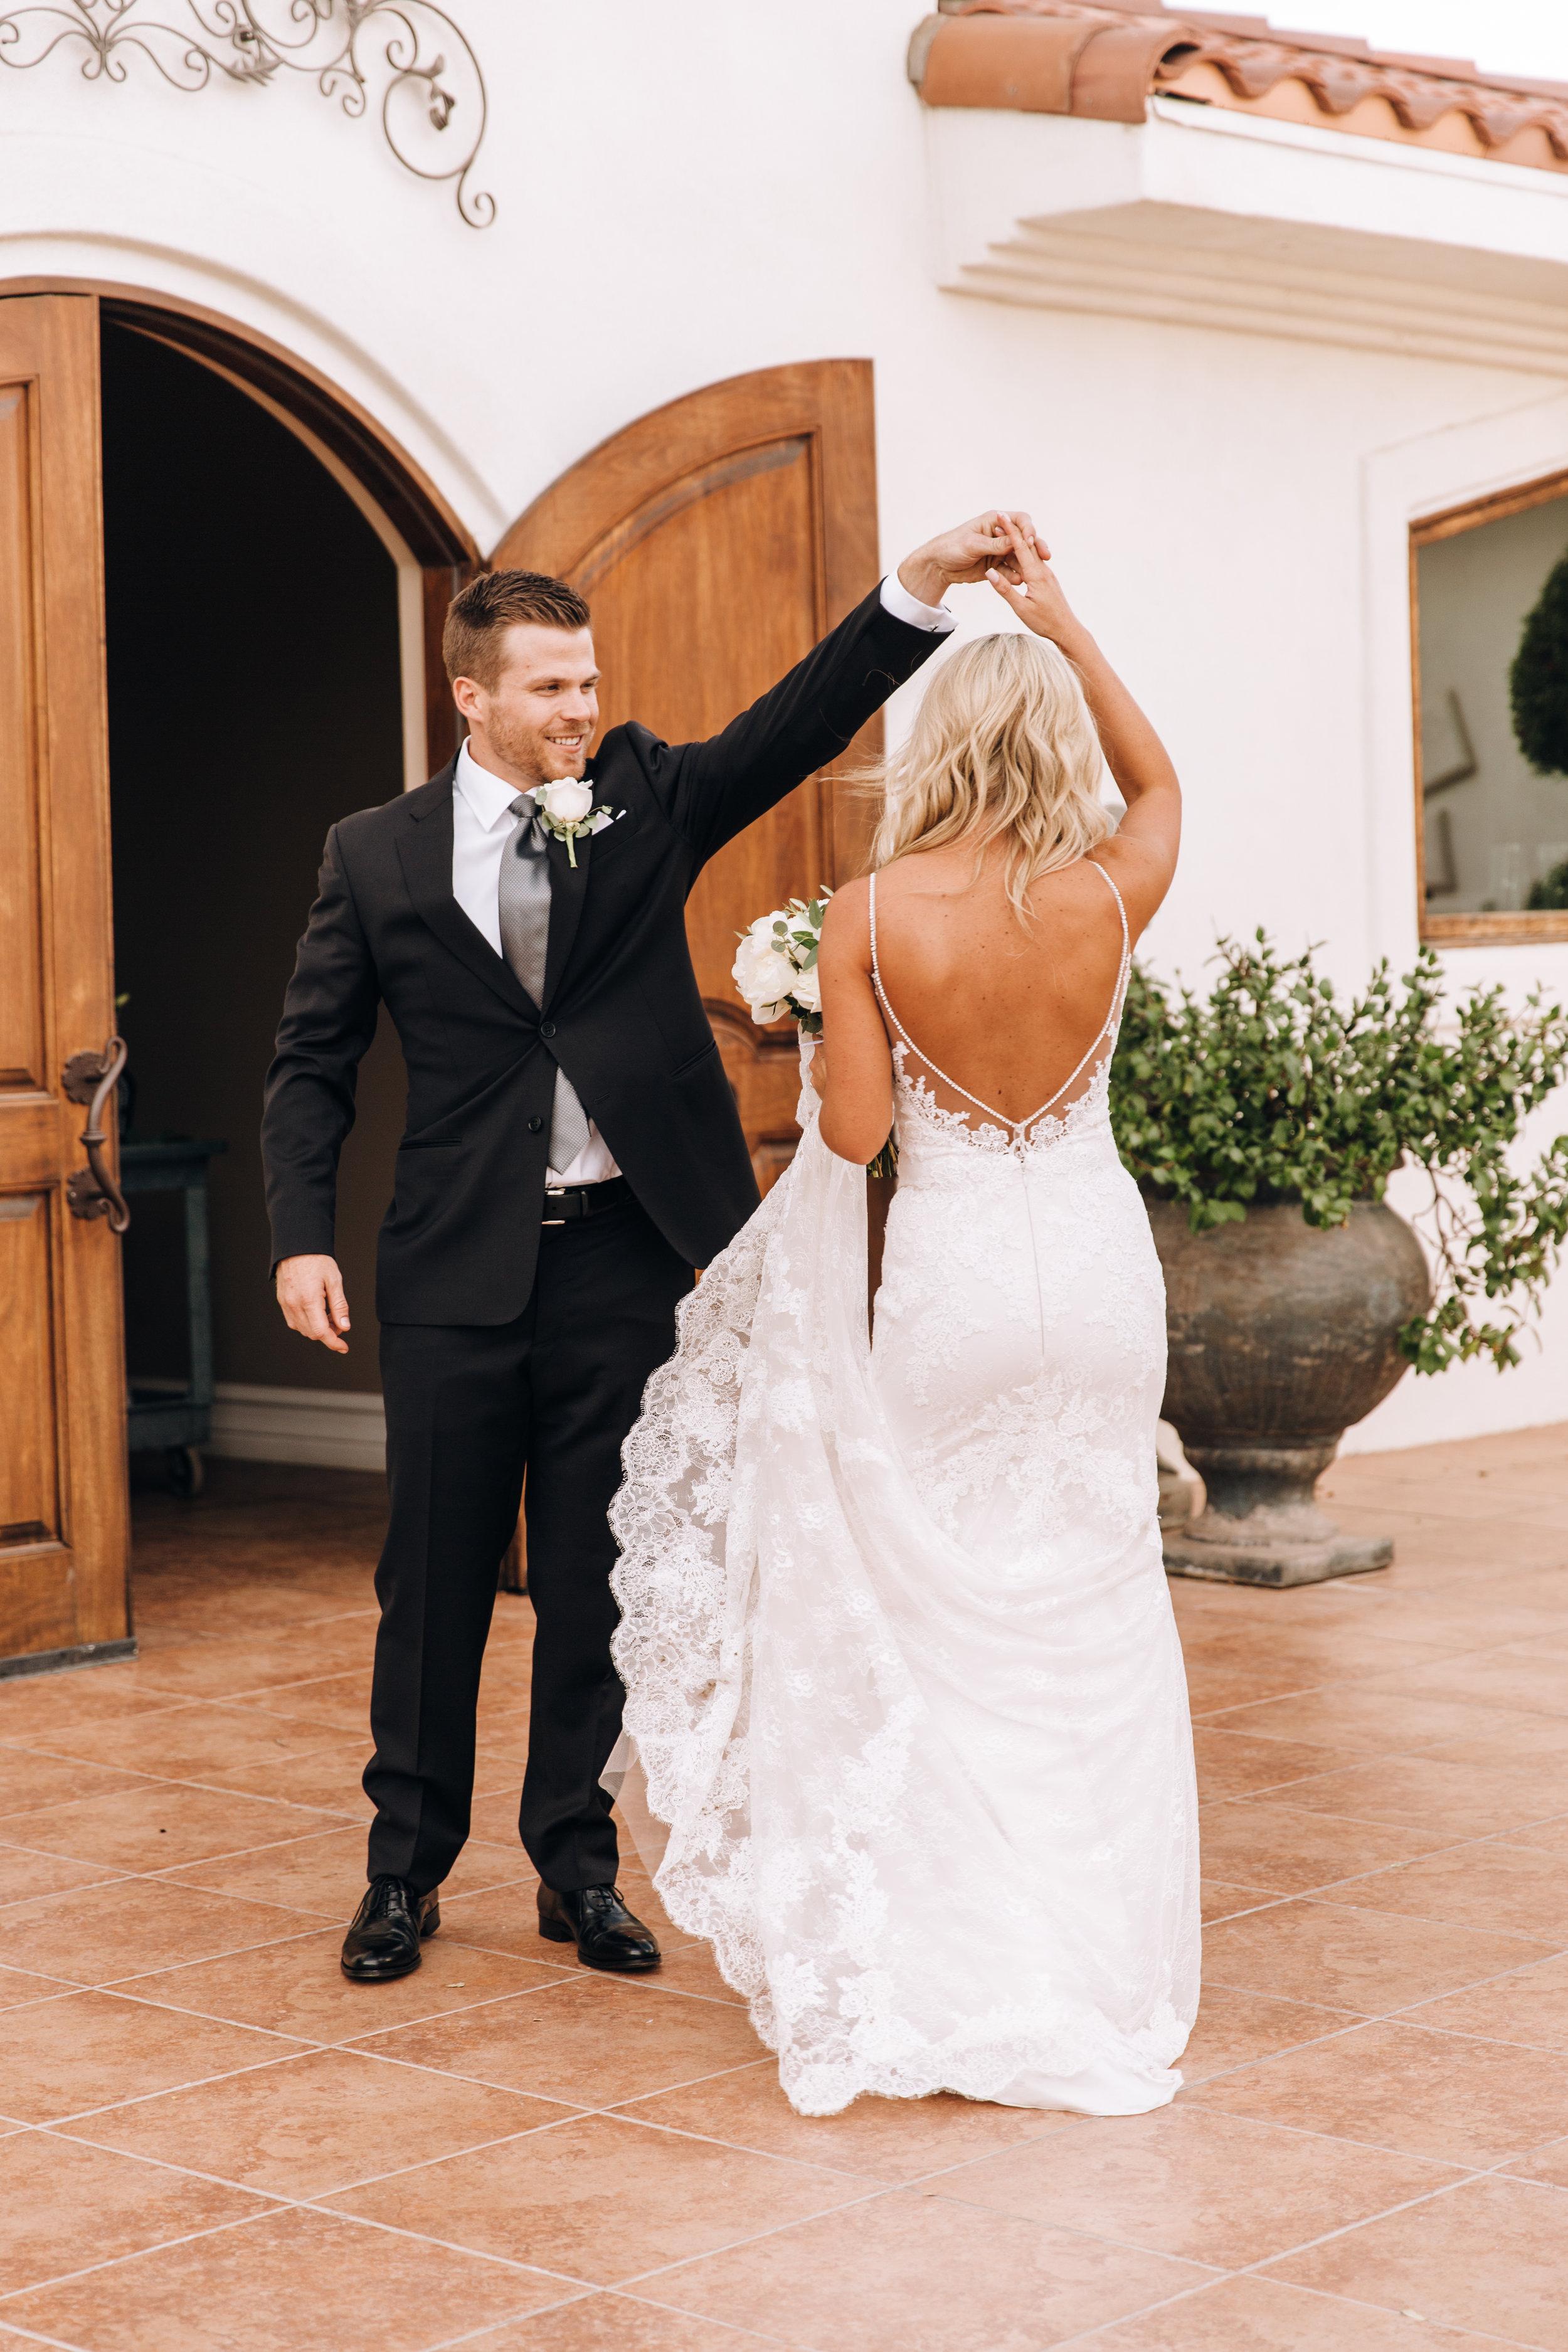 KaraNixonWeddings-Temecula-Wedding-22.jpg